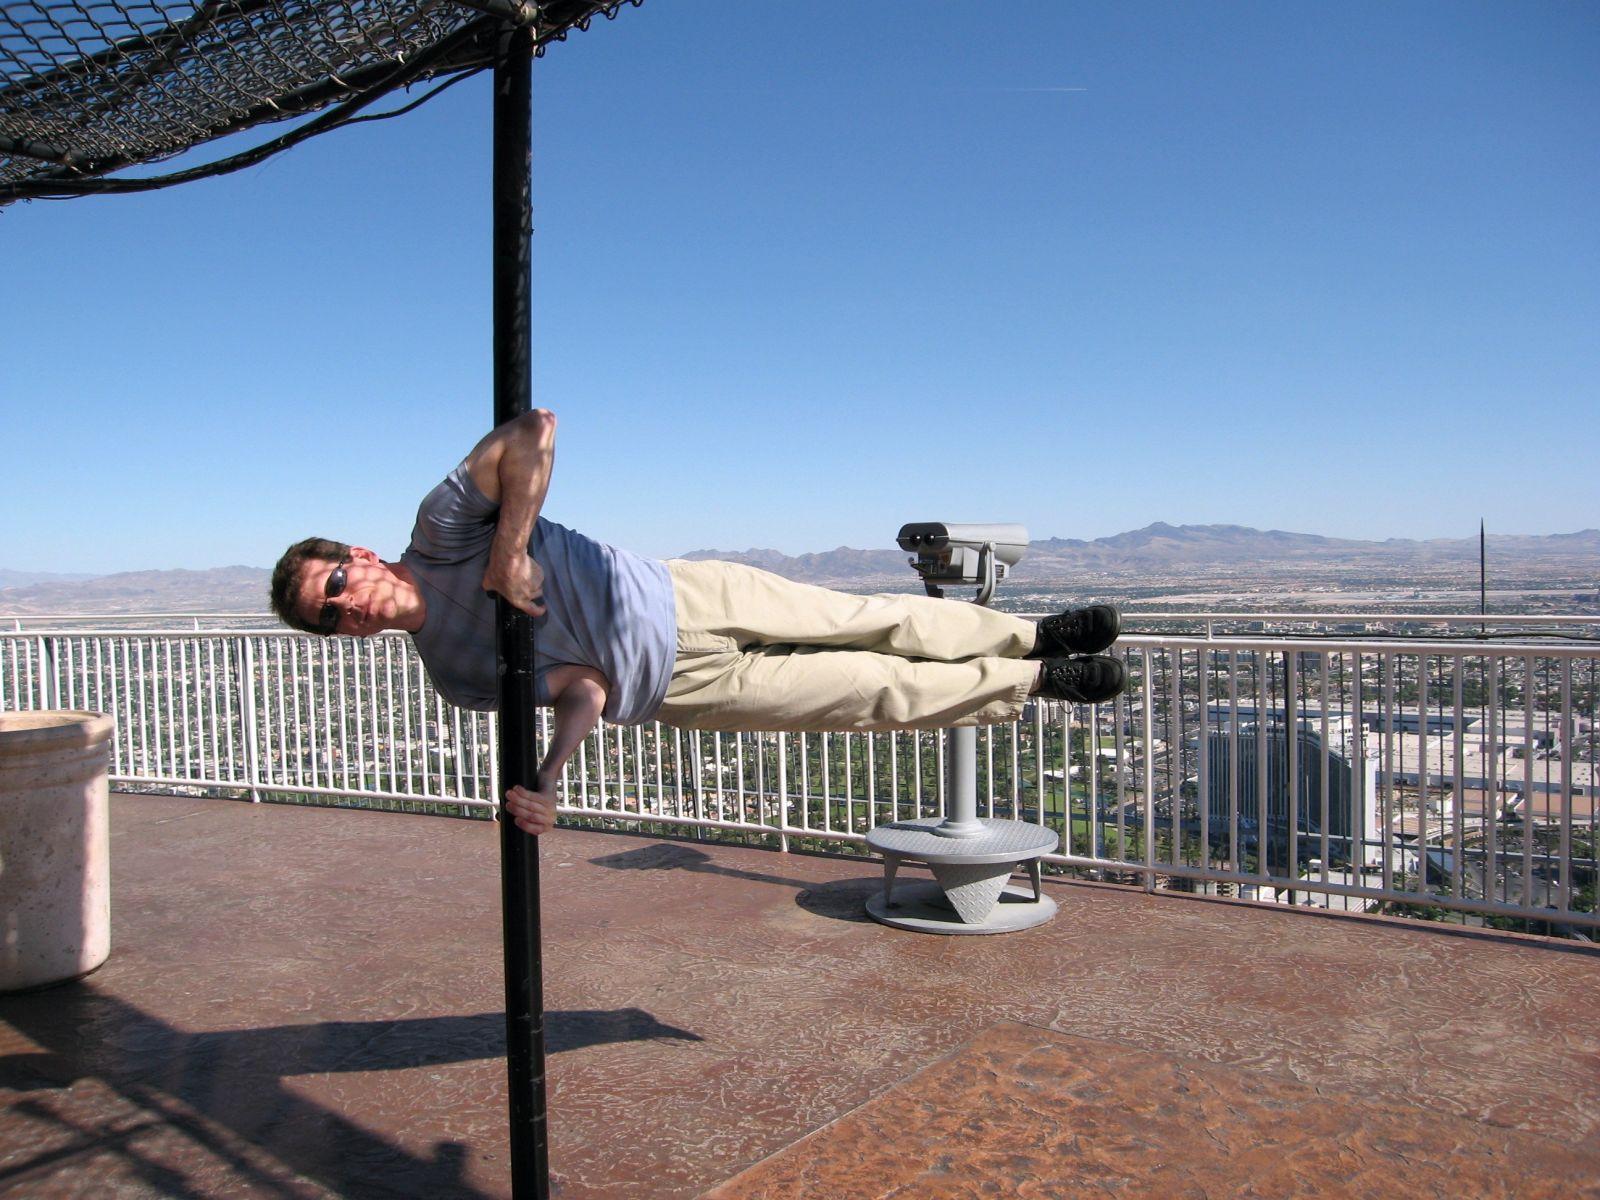 Stratosphere Hotel, Las Vegas, NV 2006